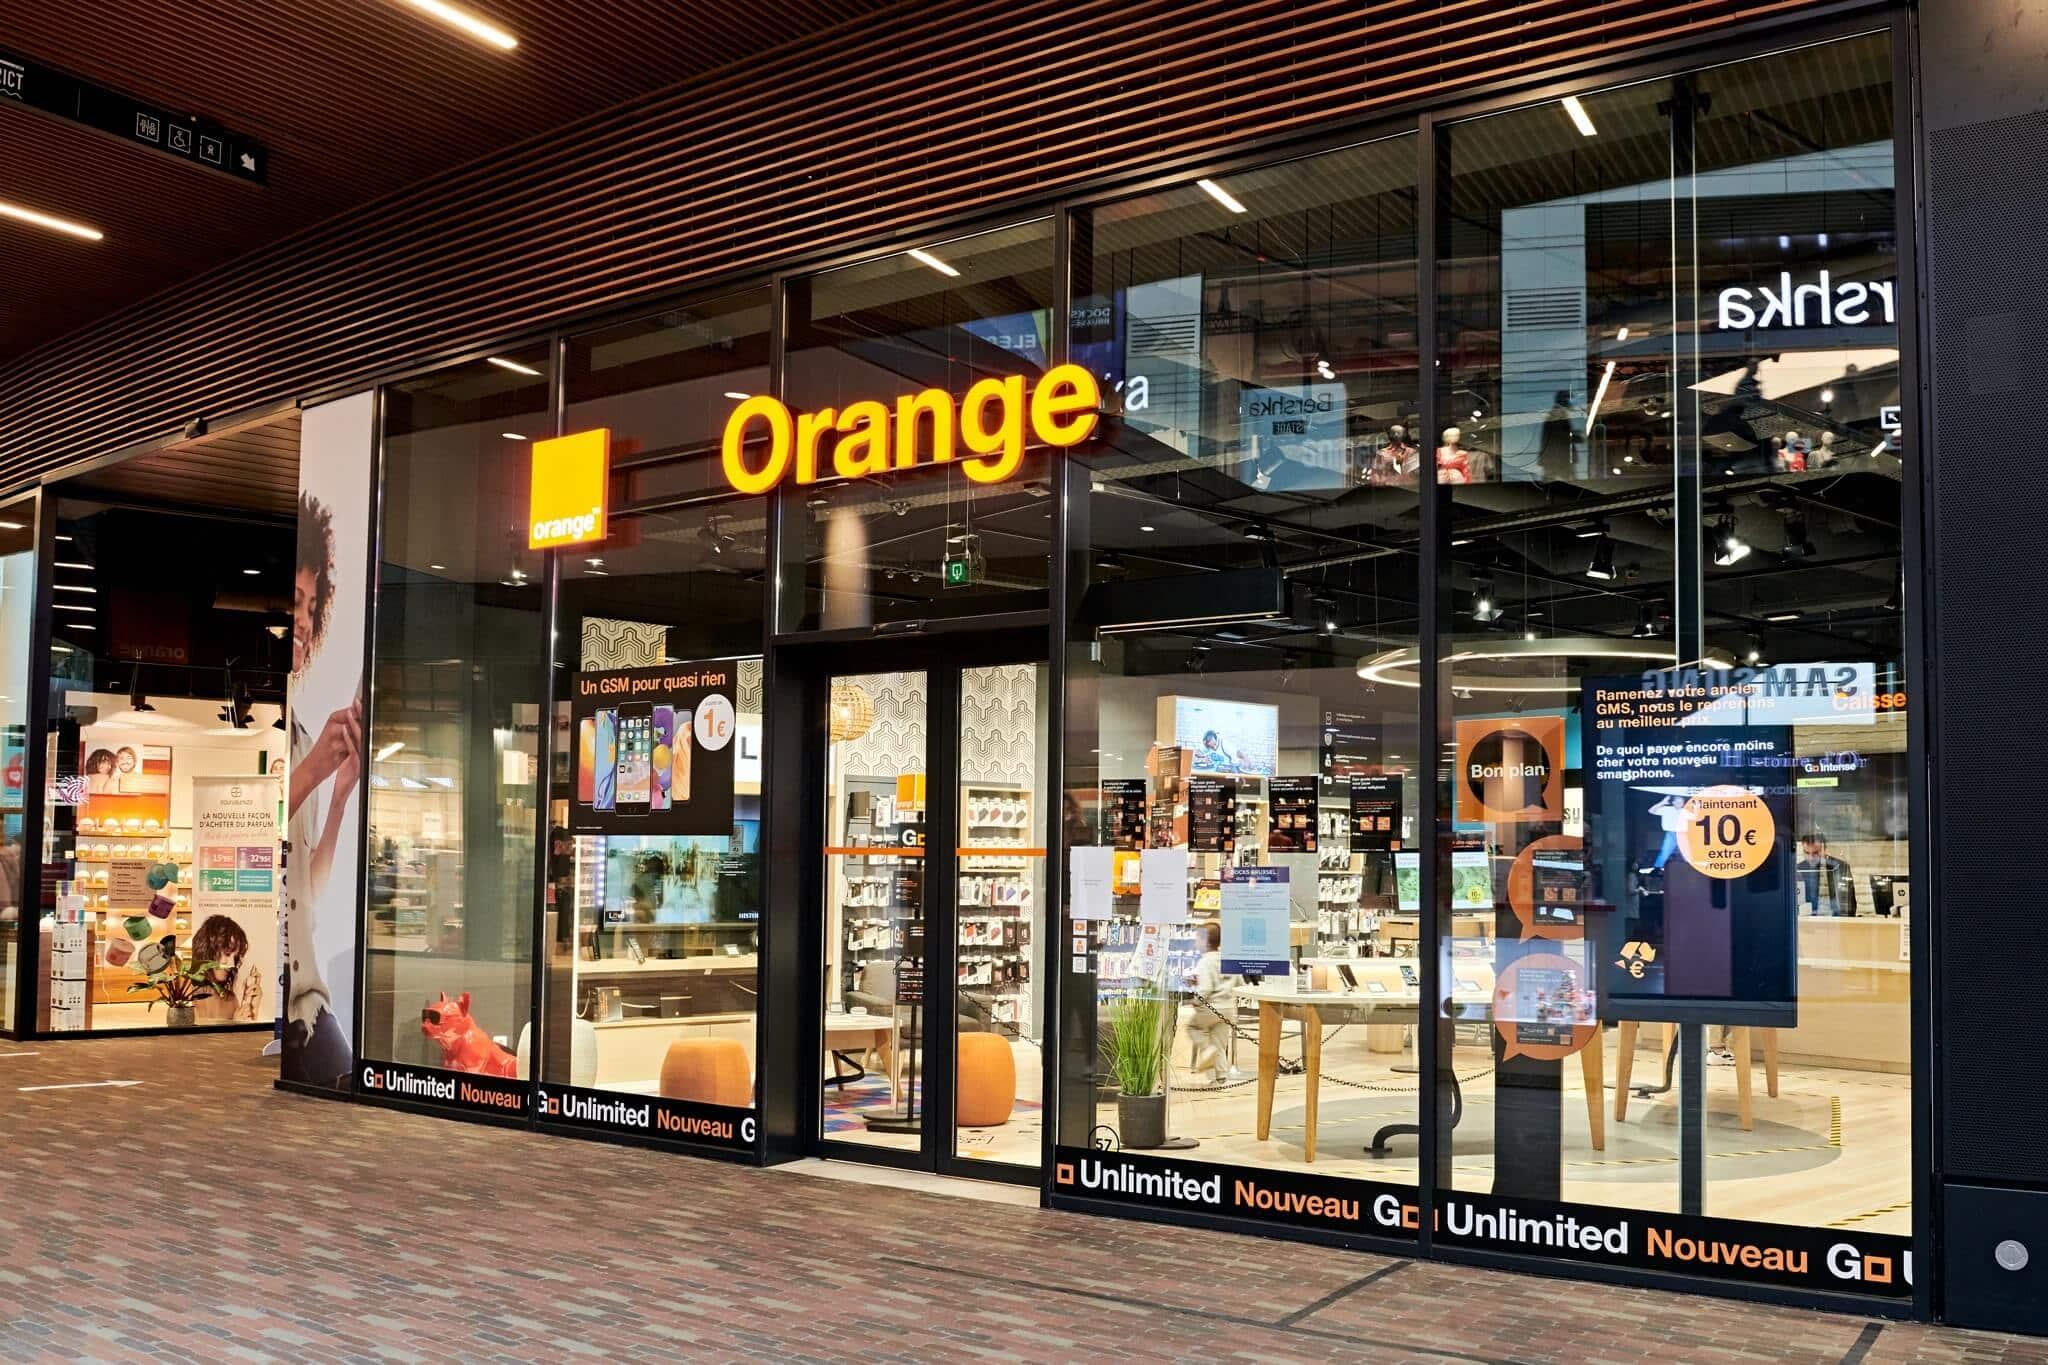 Orange | Docks Bruxsel | Shopping Center in Brussels